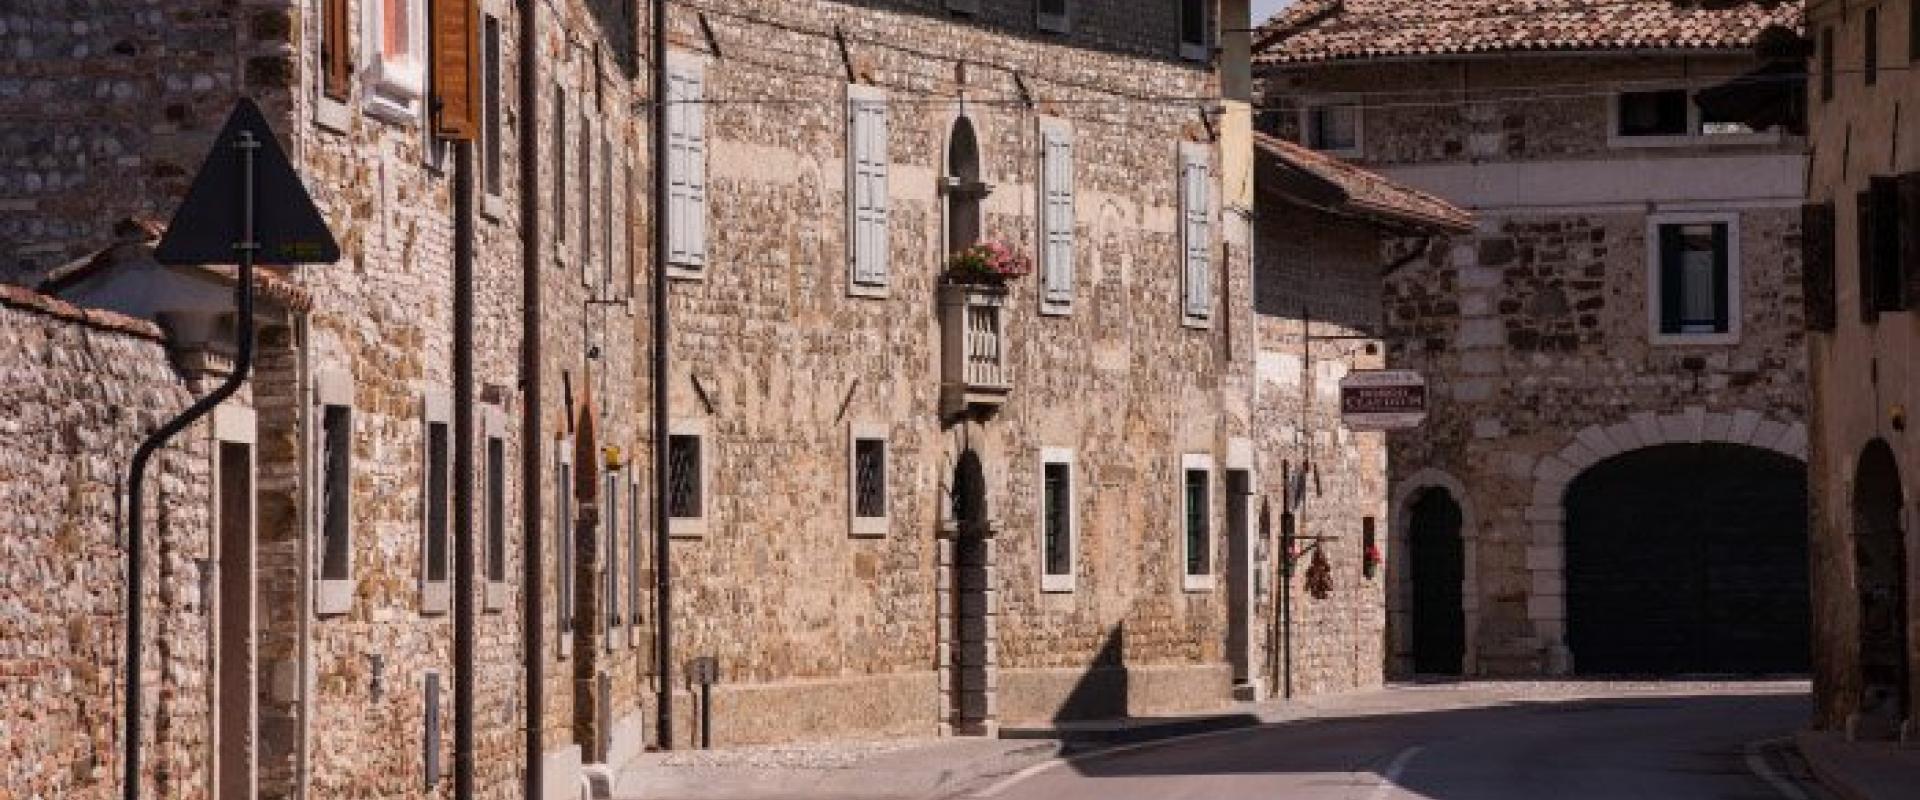 Clauiano Friuli Venezia Giulia